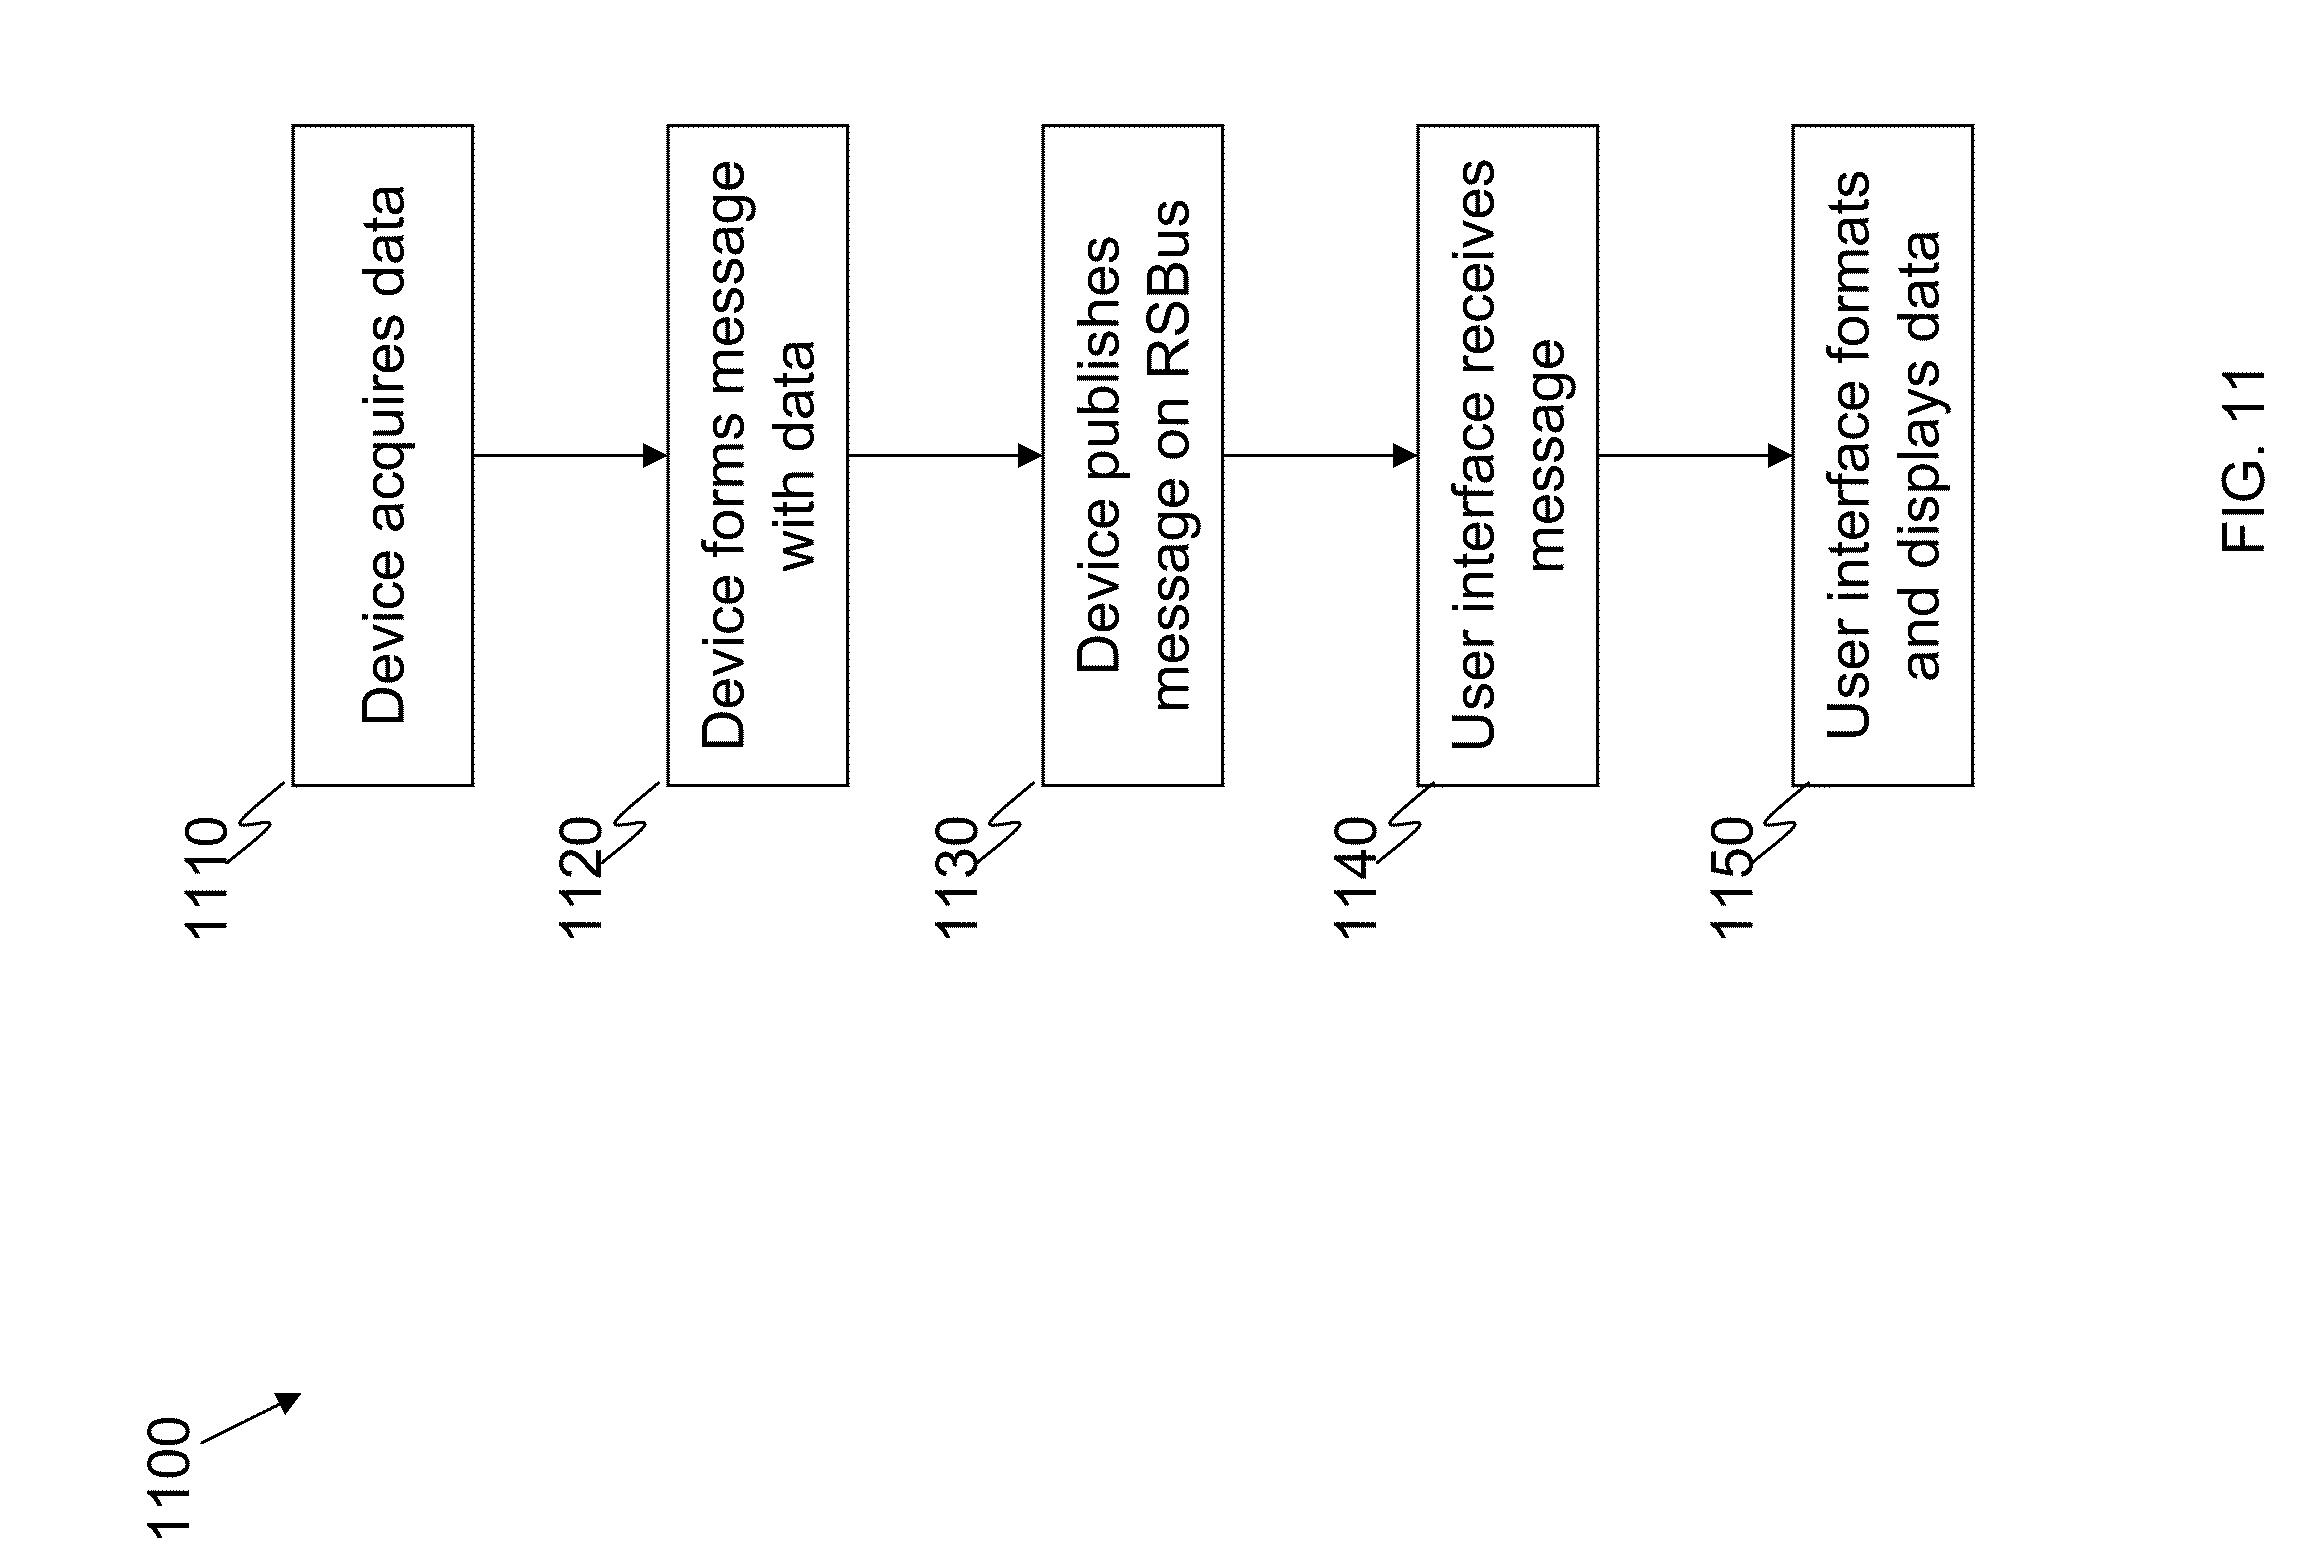 Patent US 9,678,486 B2